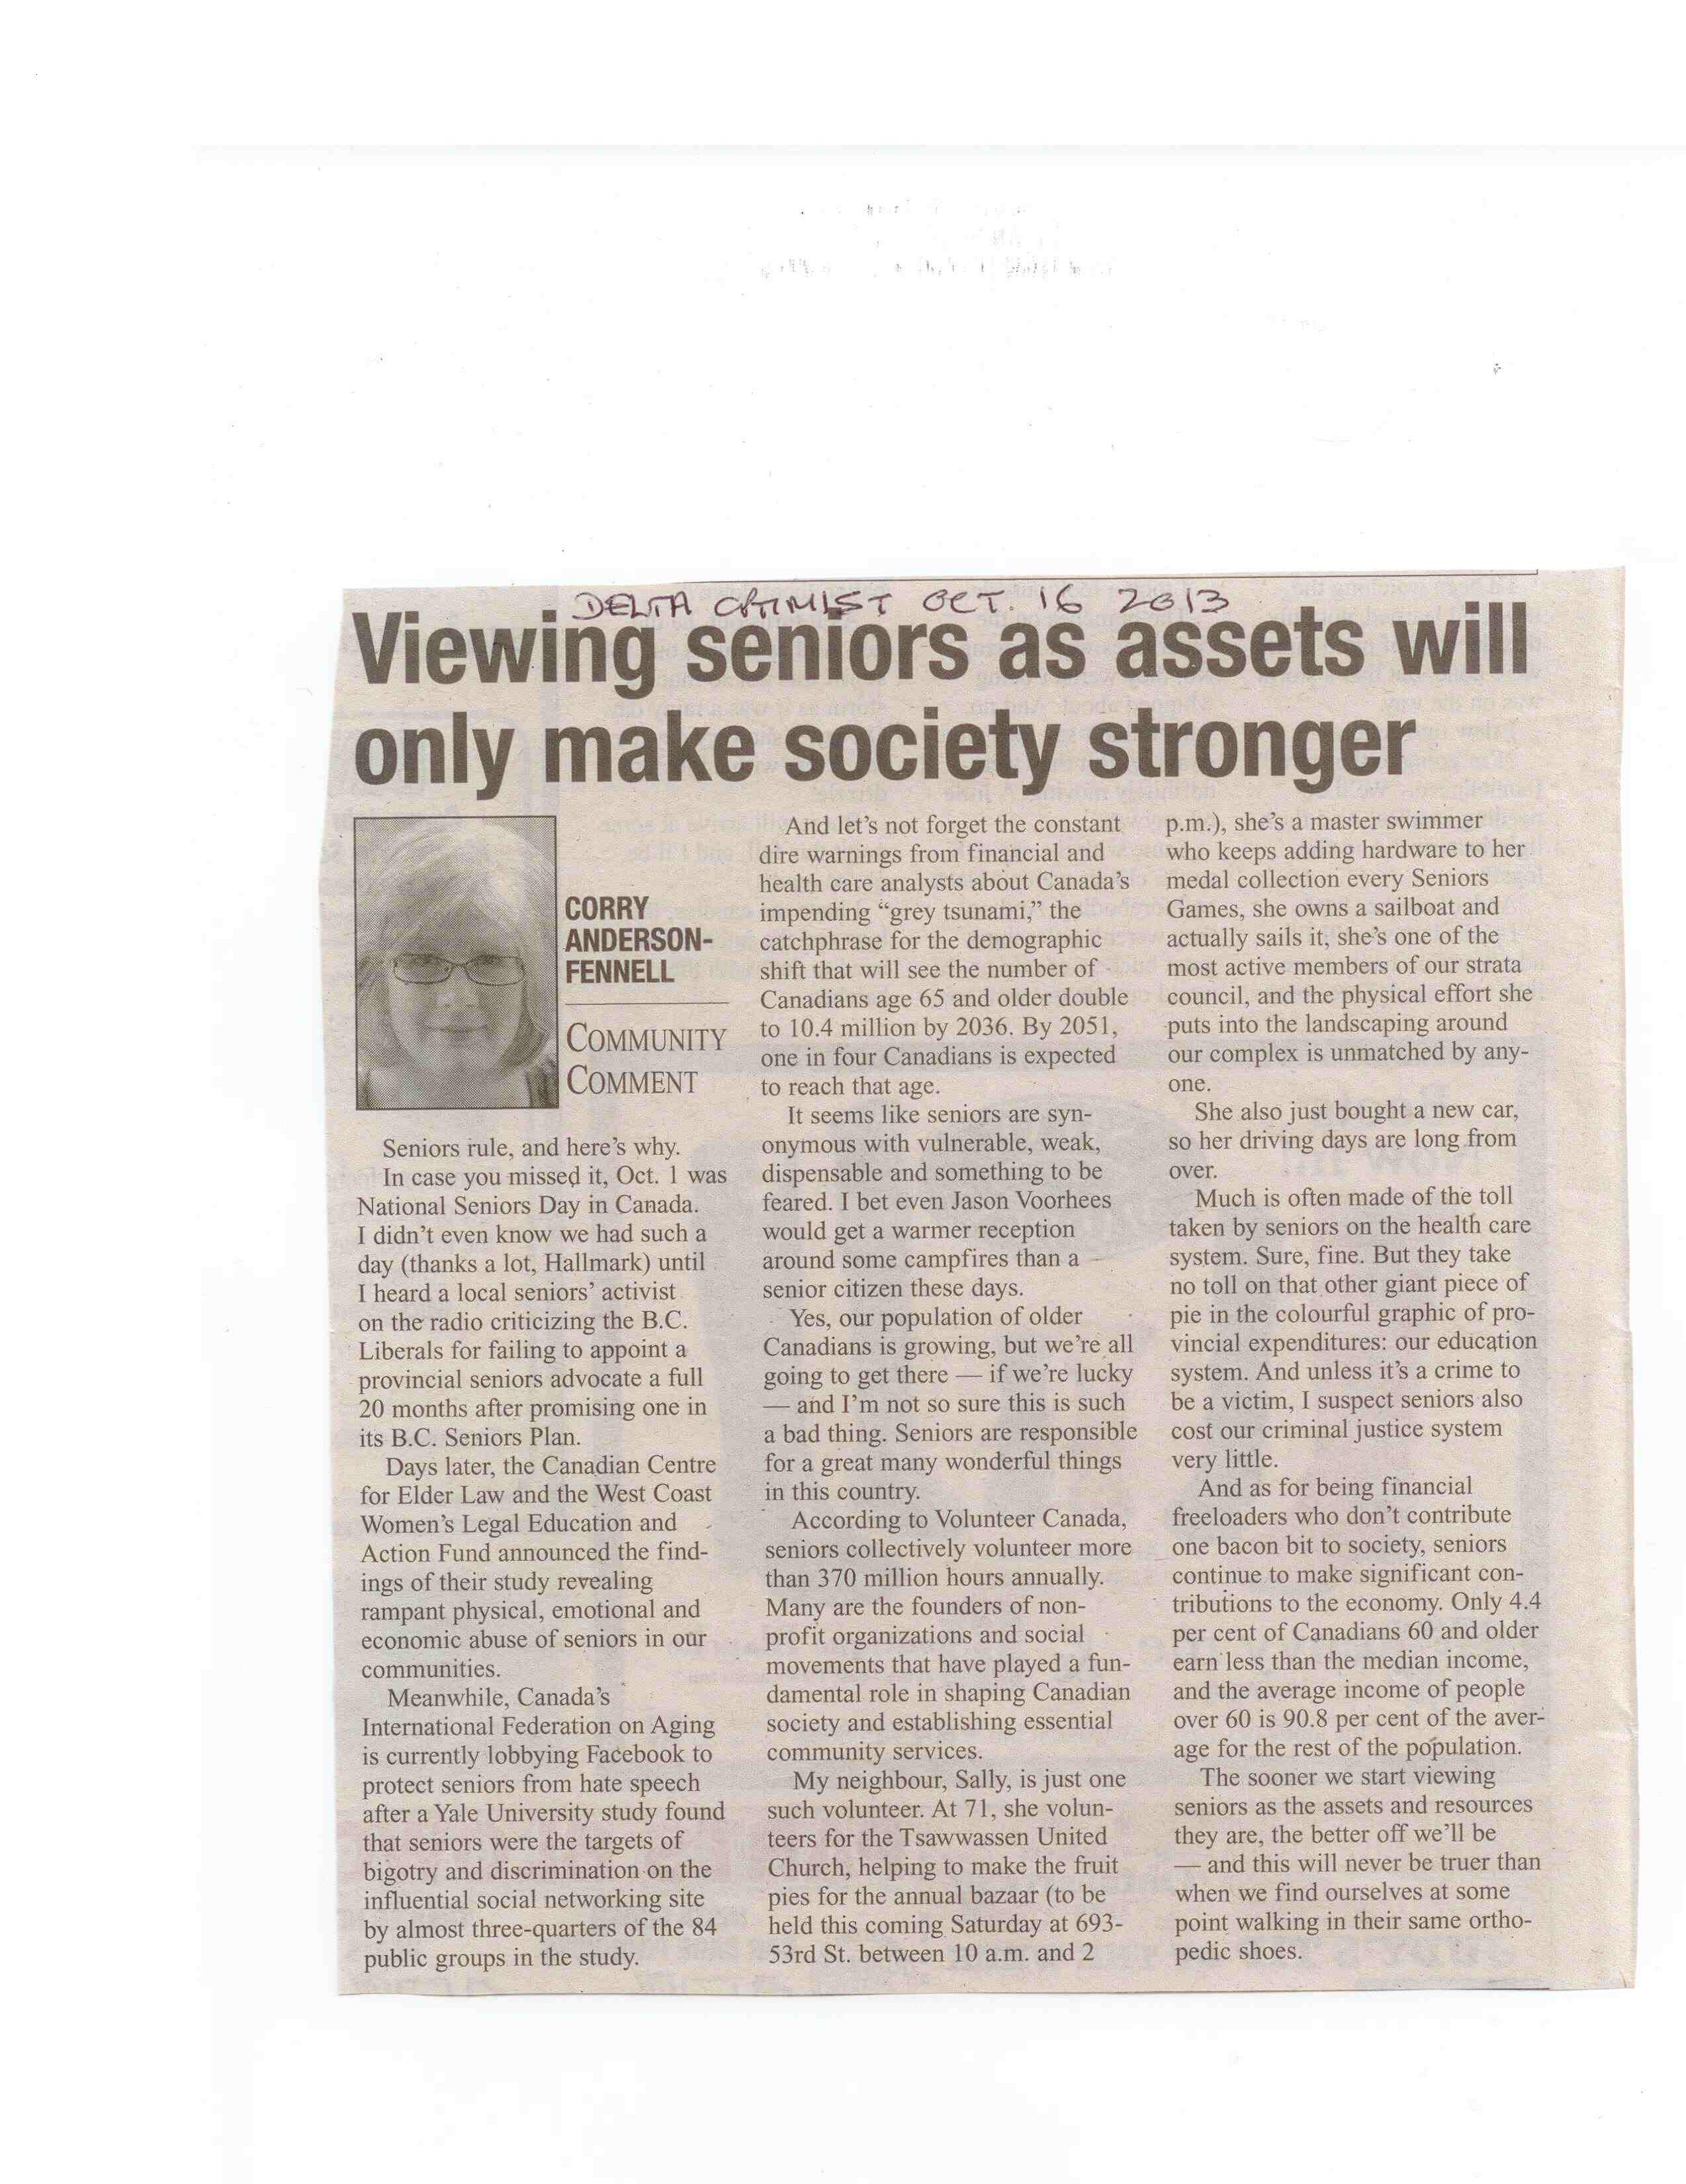 seniors article optimist october 16 2013 a